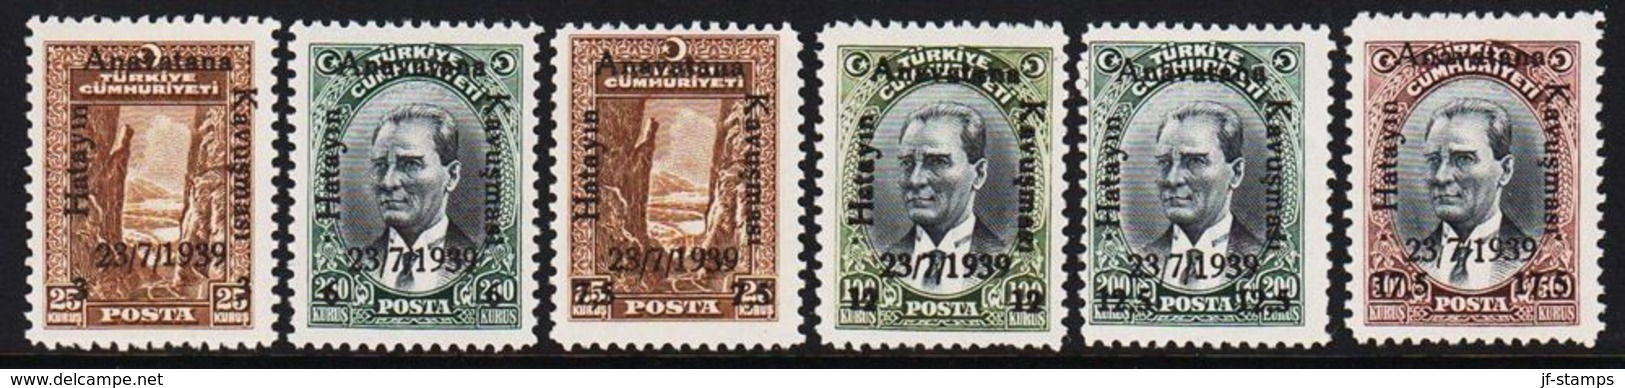 1939. Hatayin Anavatana Kavusmasi 23 7 1939. 6 Ex.  (Michel 1053 - 1058) - JF303680 - Nuevos